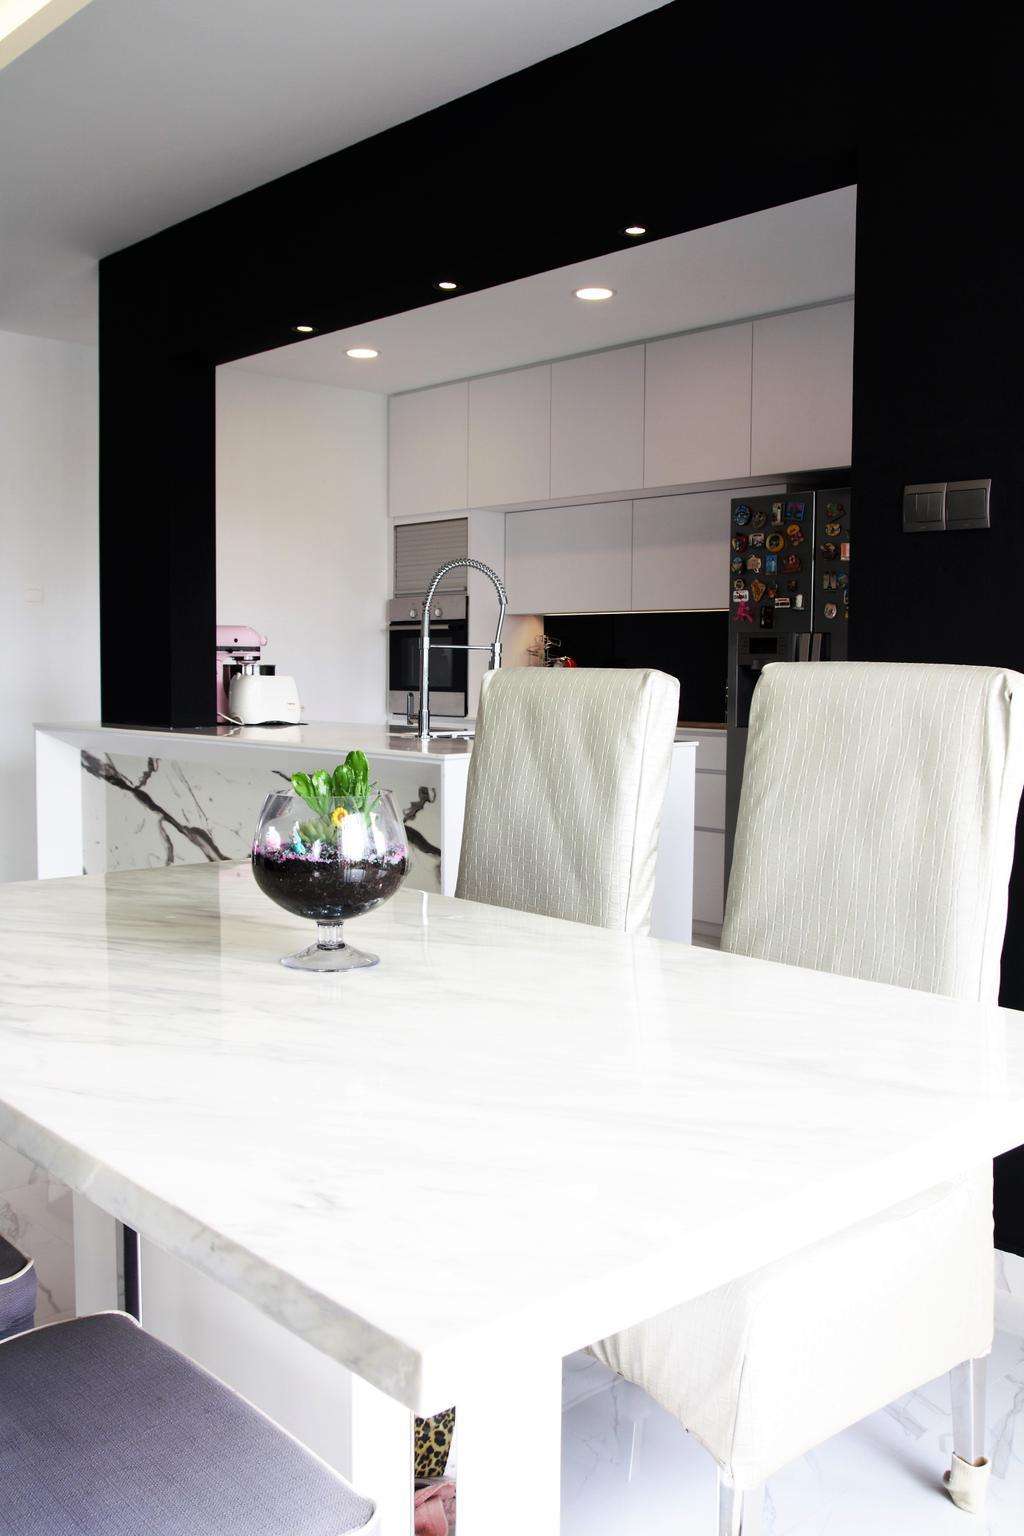 Landed, Bedok, Interior Designer, Intrigue-d Design Consultancy, Dining Table, Furniture, Table, Glass